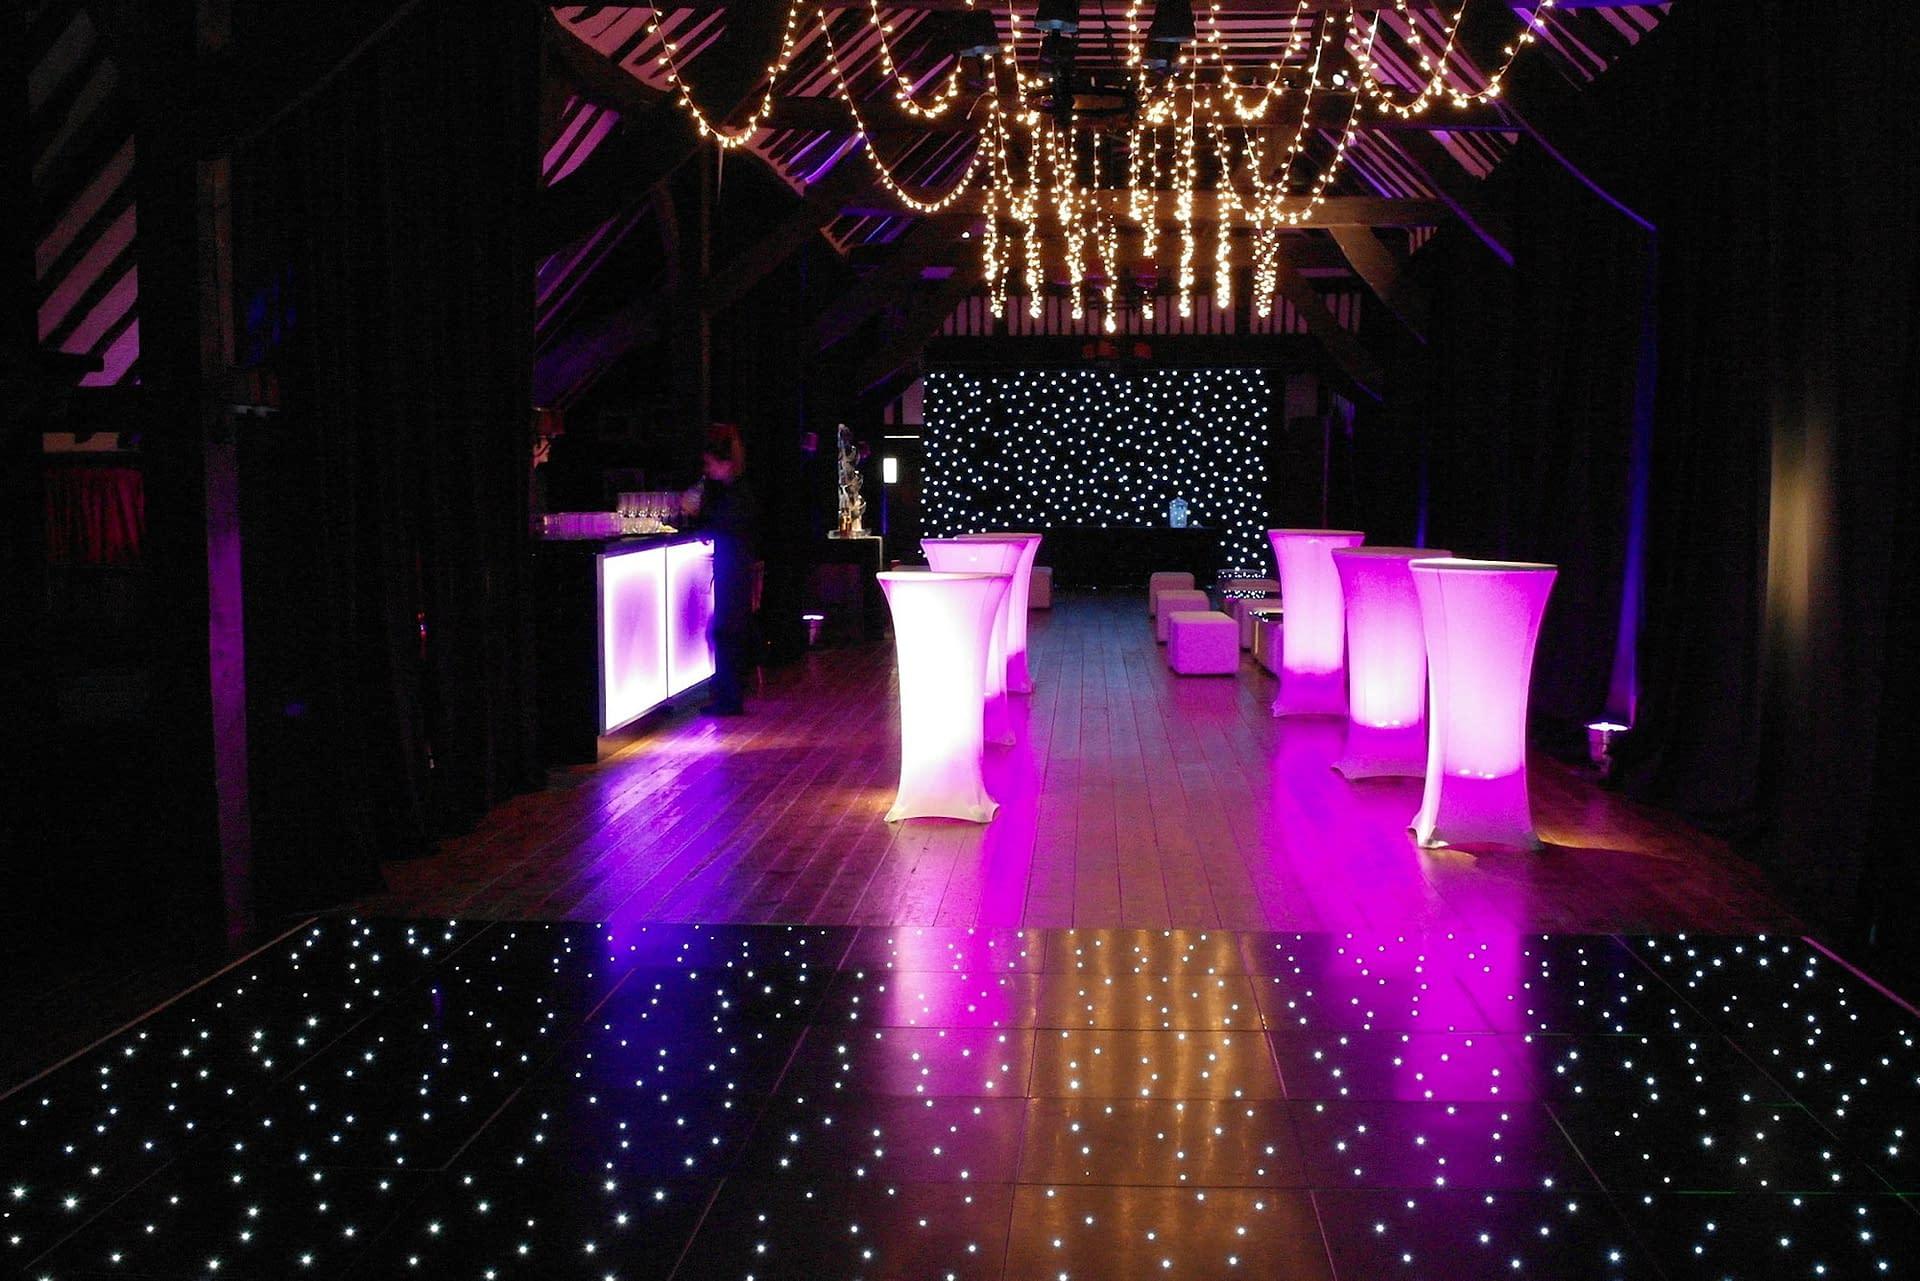 Starcloth backdrop, black wall draping, illuminated furniture and starlit dance floor at Ramster wedding venue UK